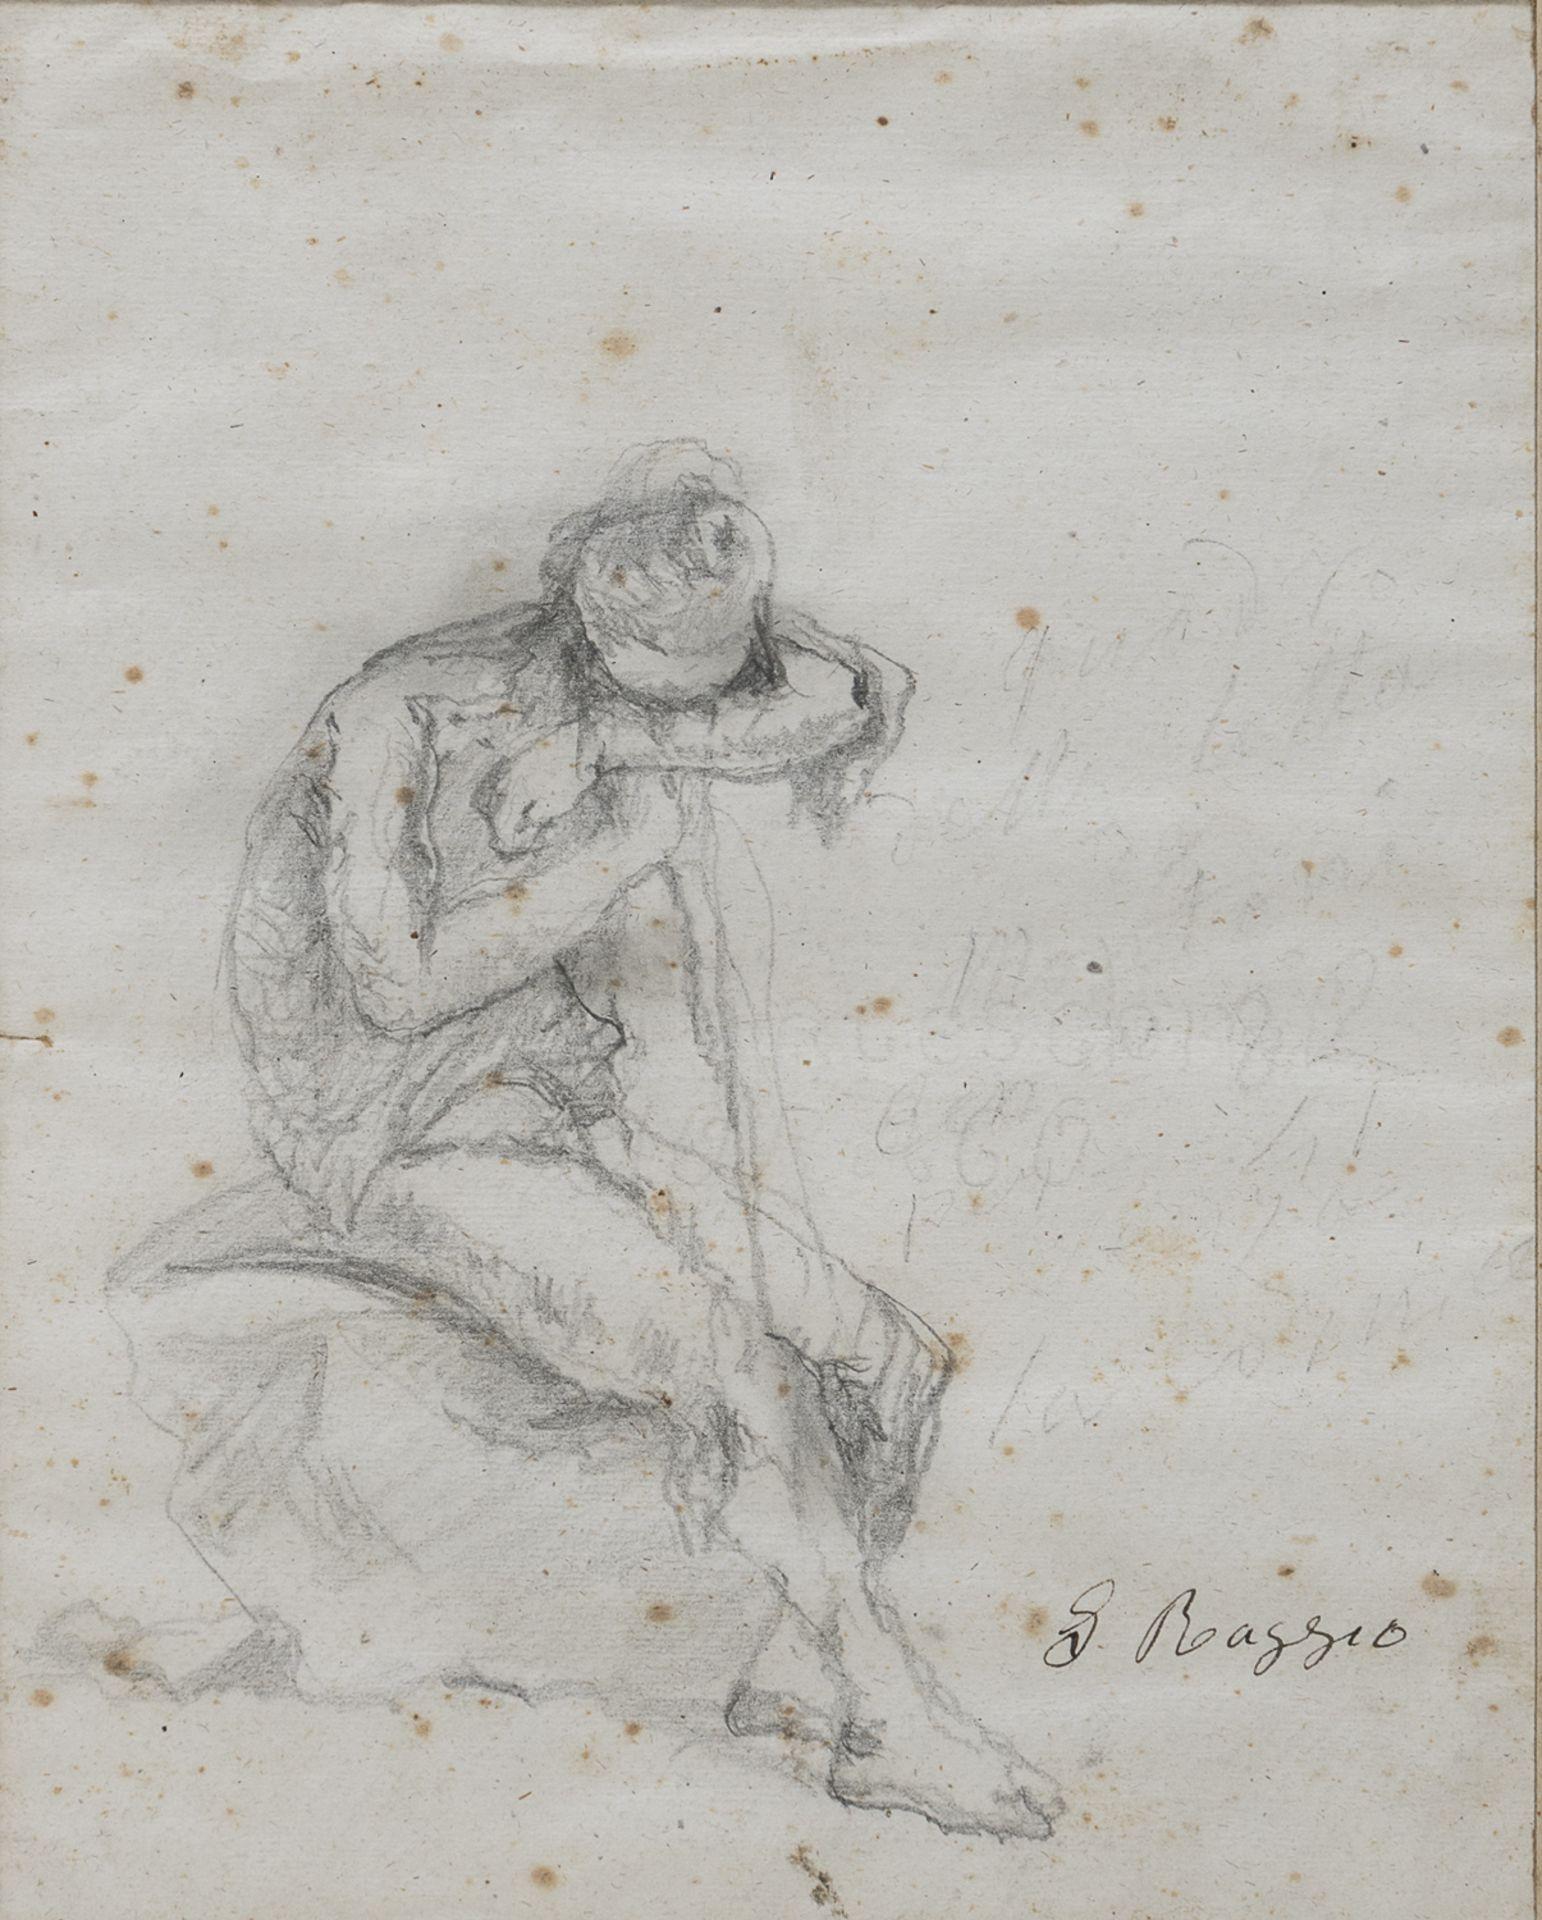 PENCIL DRAWING OF A SITTING SHEPHERD SIGNED 'G. RAGGIO' 19TH CENTURY